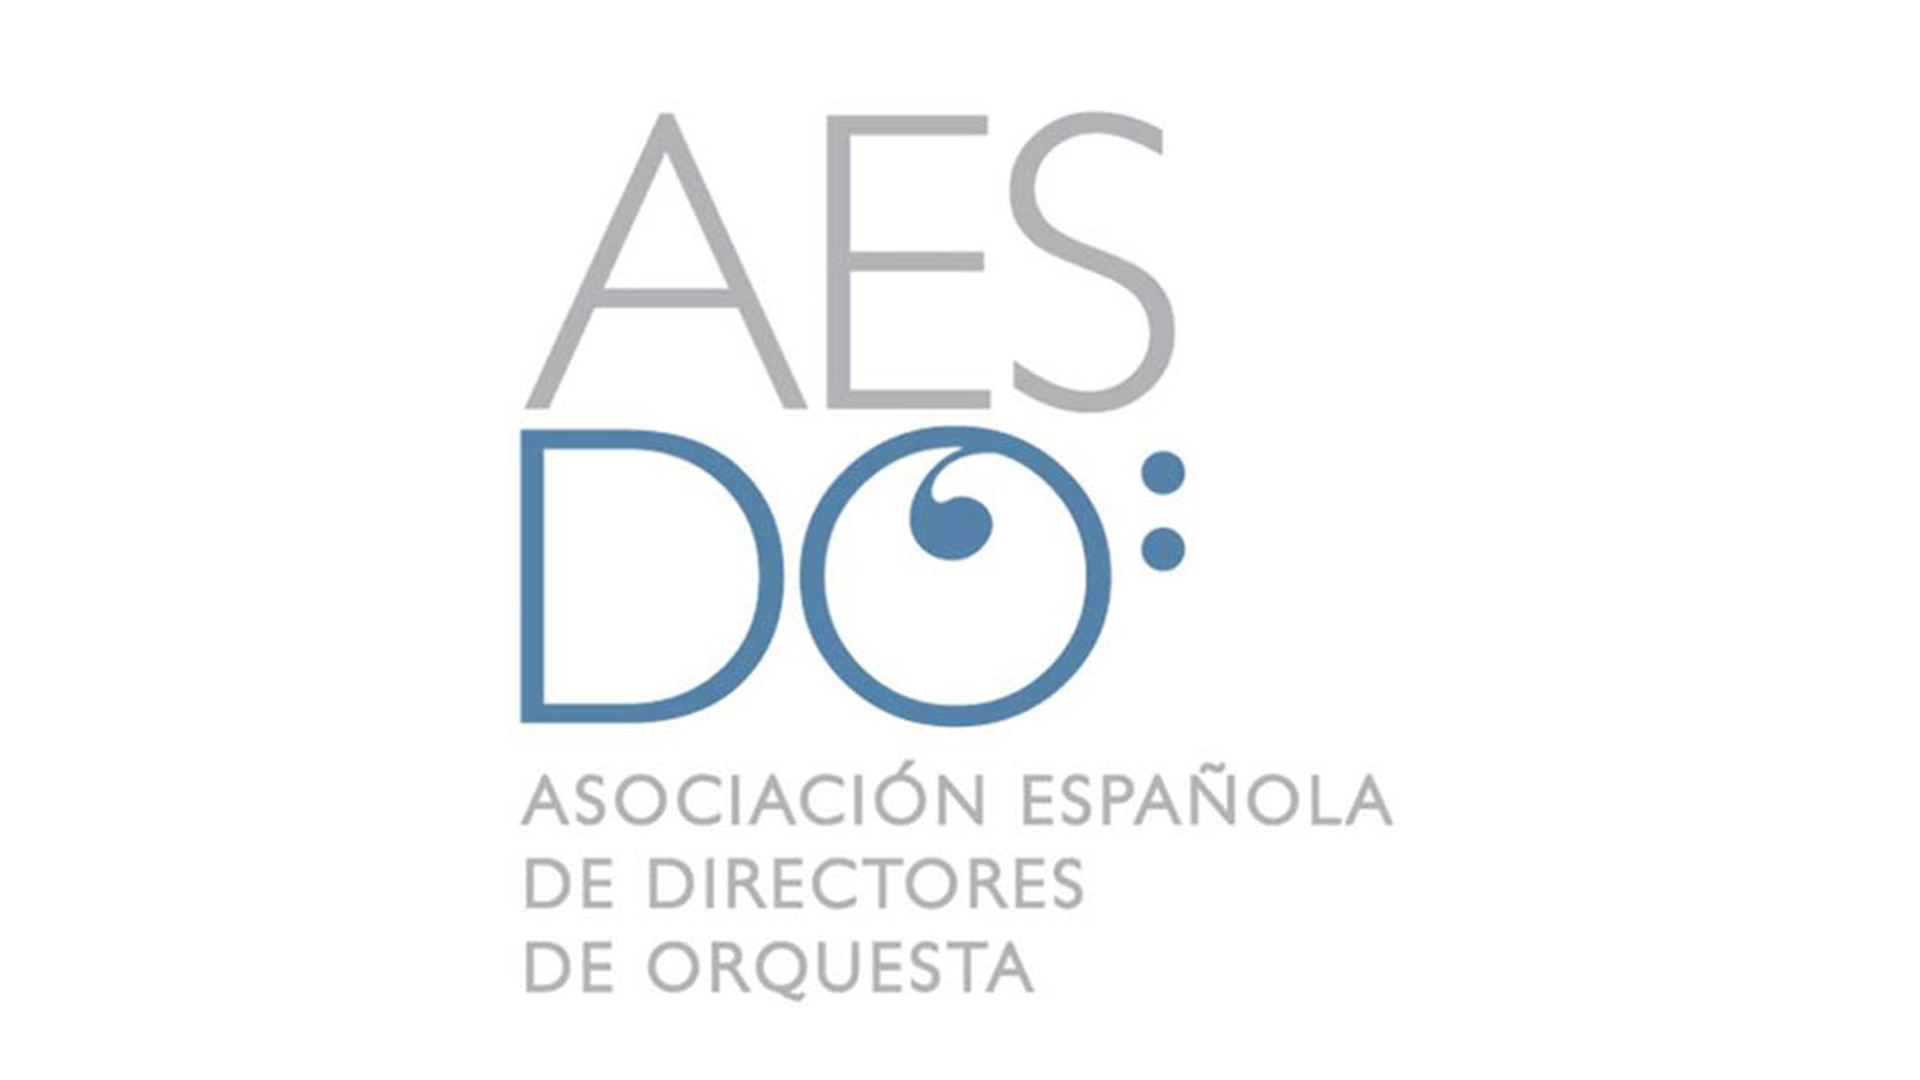 AESDO-Directores-Orquesta